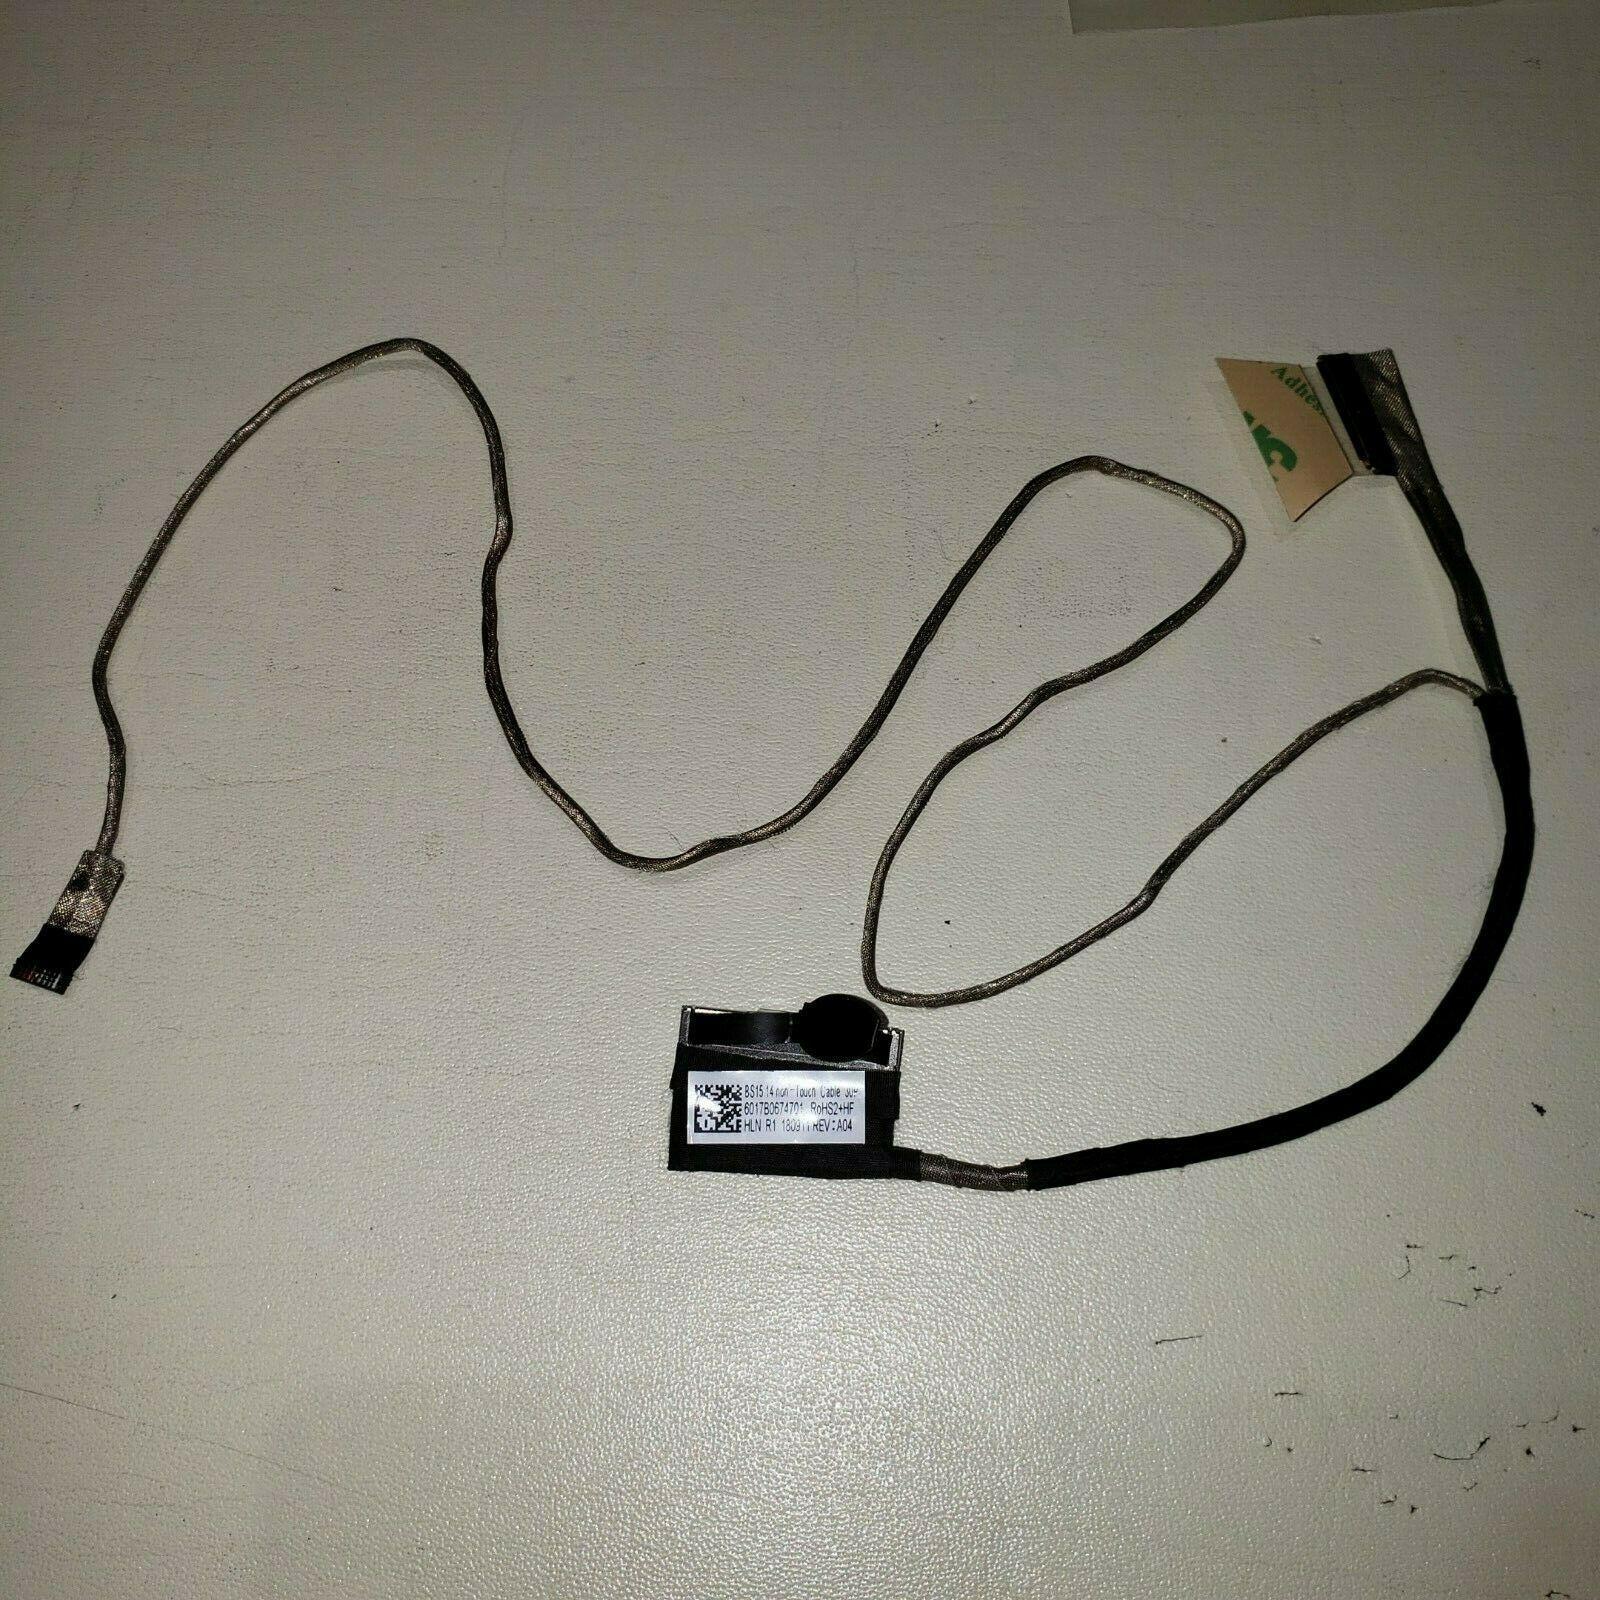 HP 프로 북 (640) G2 645 G2 6017B0674701 LVDS 케이블 노트북 LCD 케이블